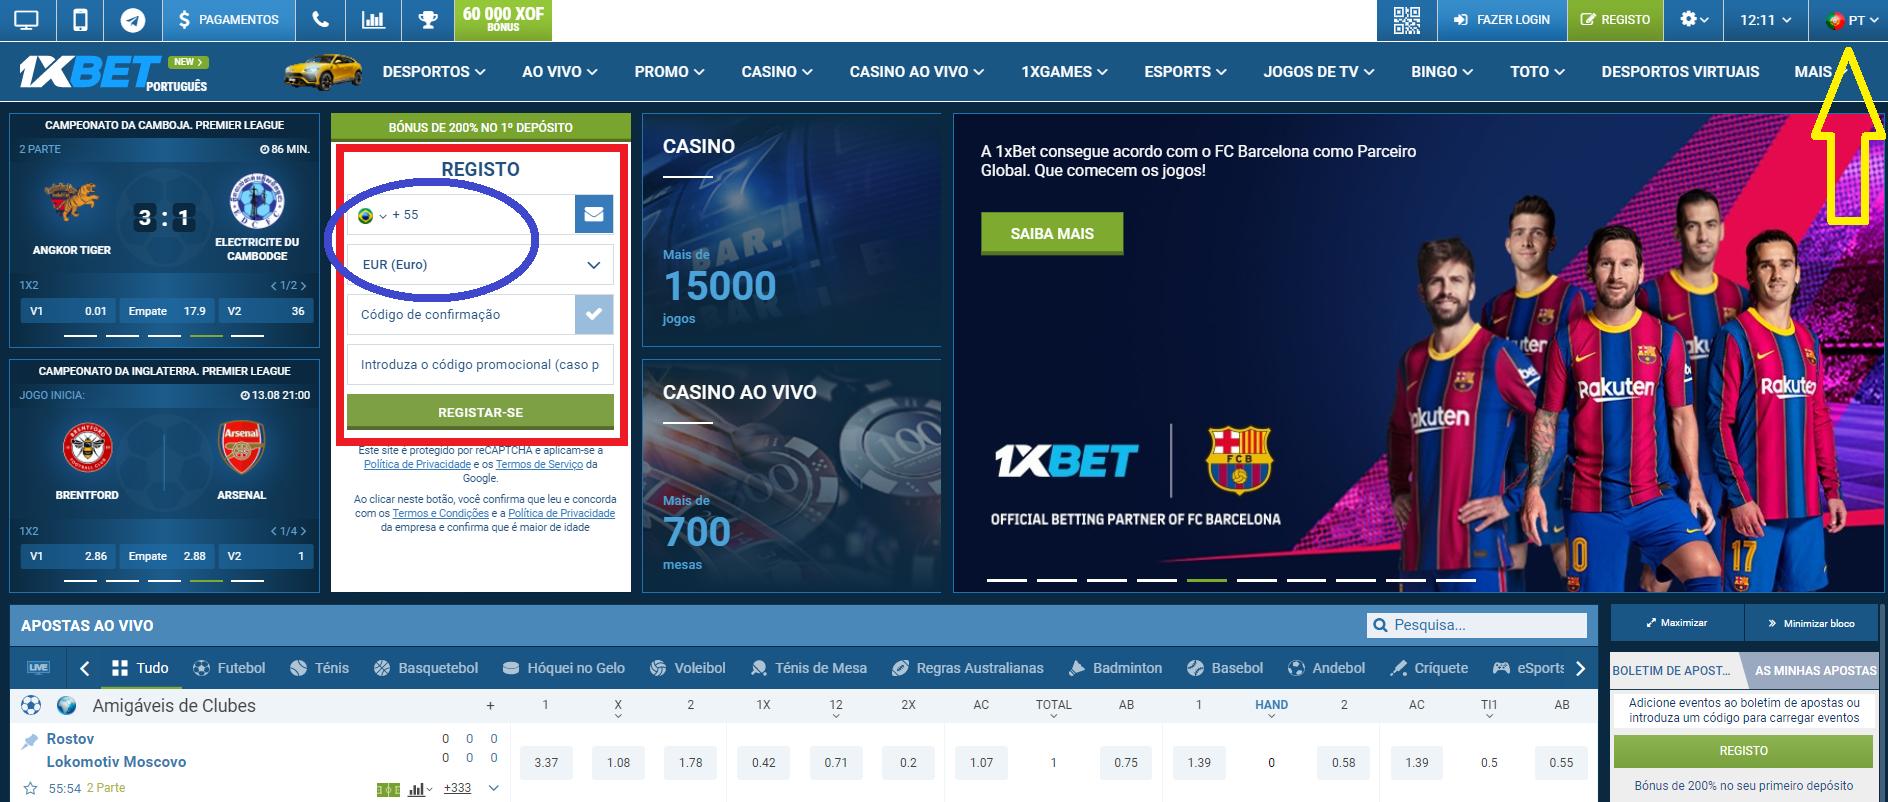 1xBet app download de Portugal